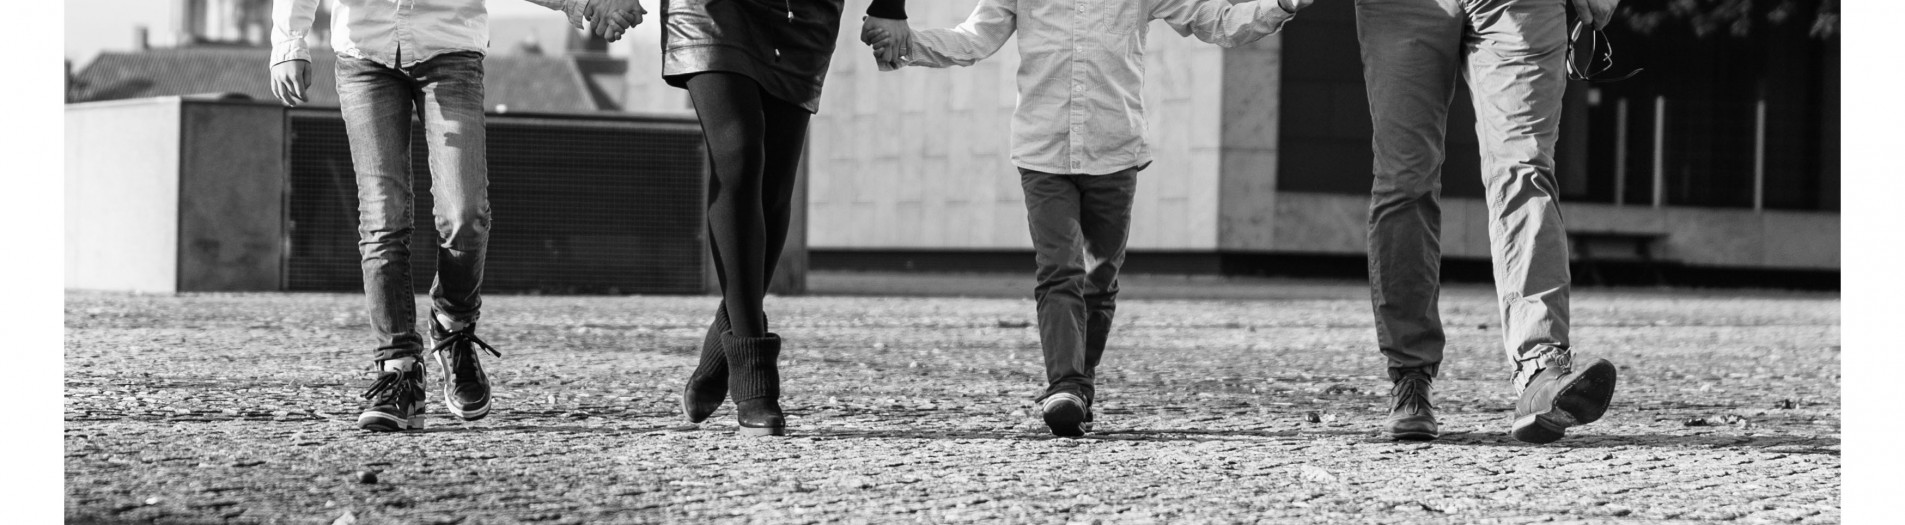 gezinsfotoshoot, gezinsfotografie Breda